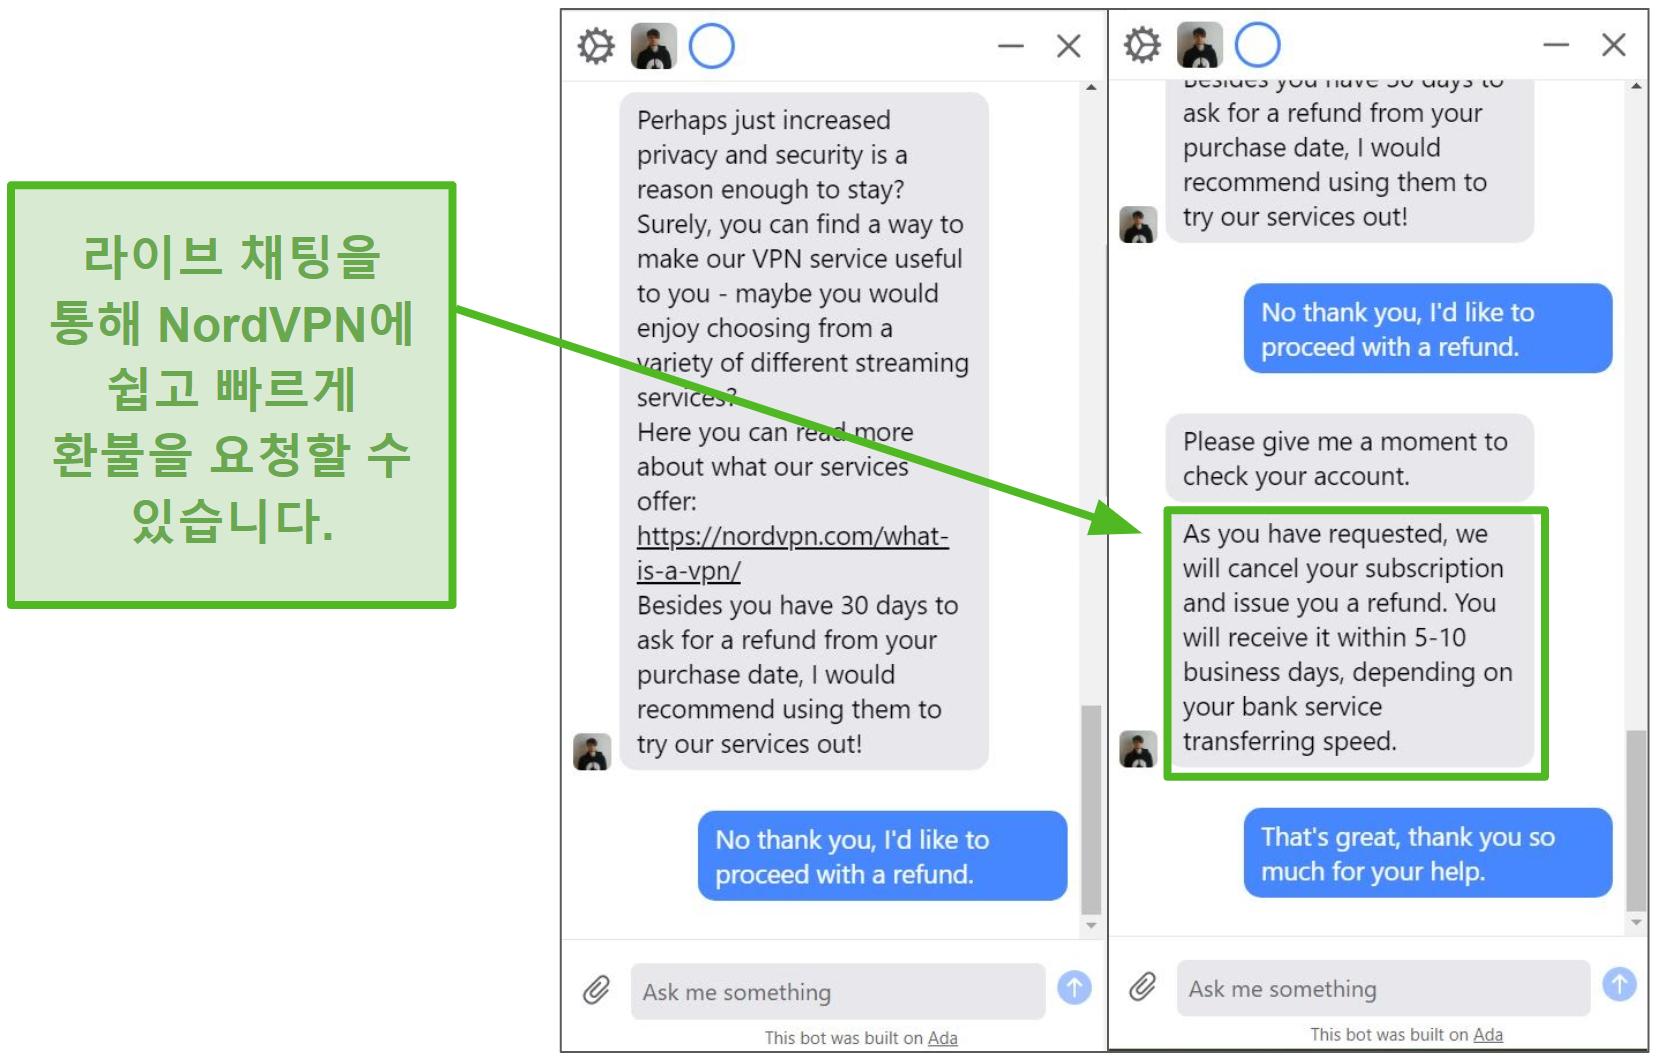 NordVPN의 고객 지원 라이브 채팅을 통해 시작되고 승인되는 환불 스크린 샷